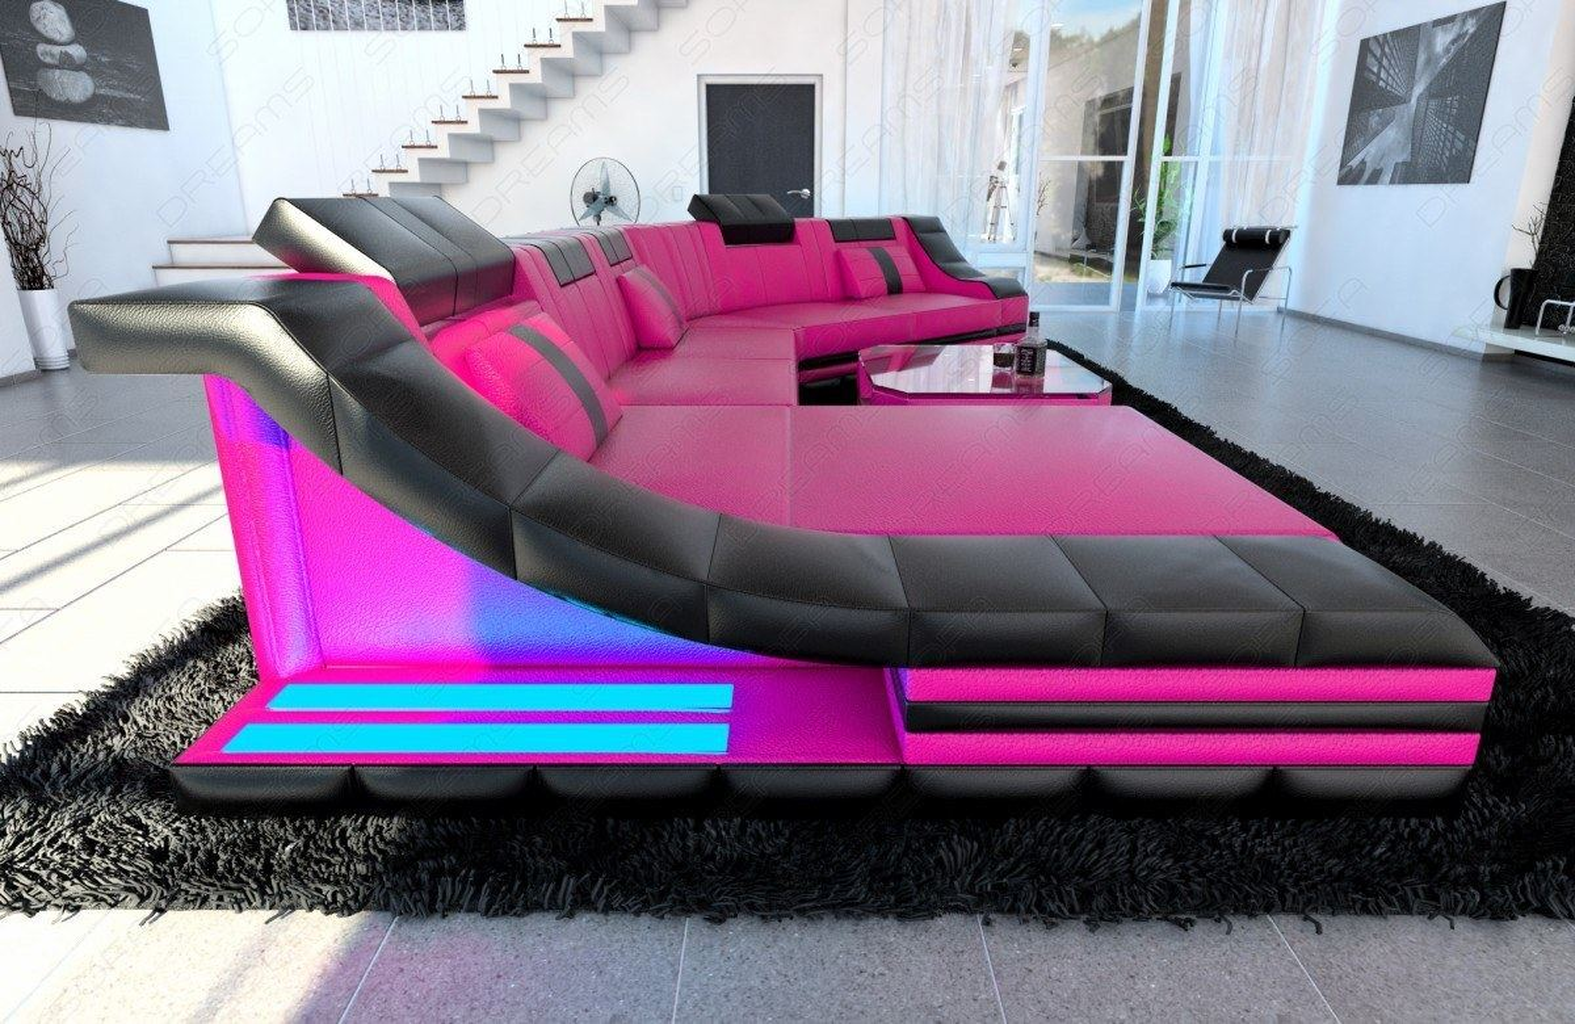 xxl sofa mit beleuchtung corner sofa xxl interior design. Black Bedroom Furniture Sets. Home Design Ideas